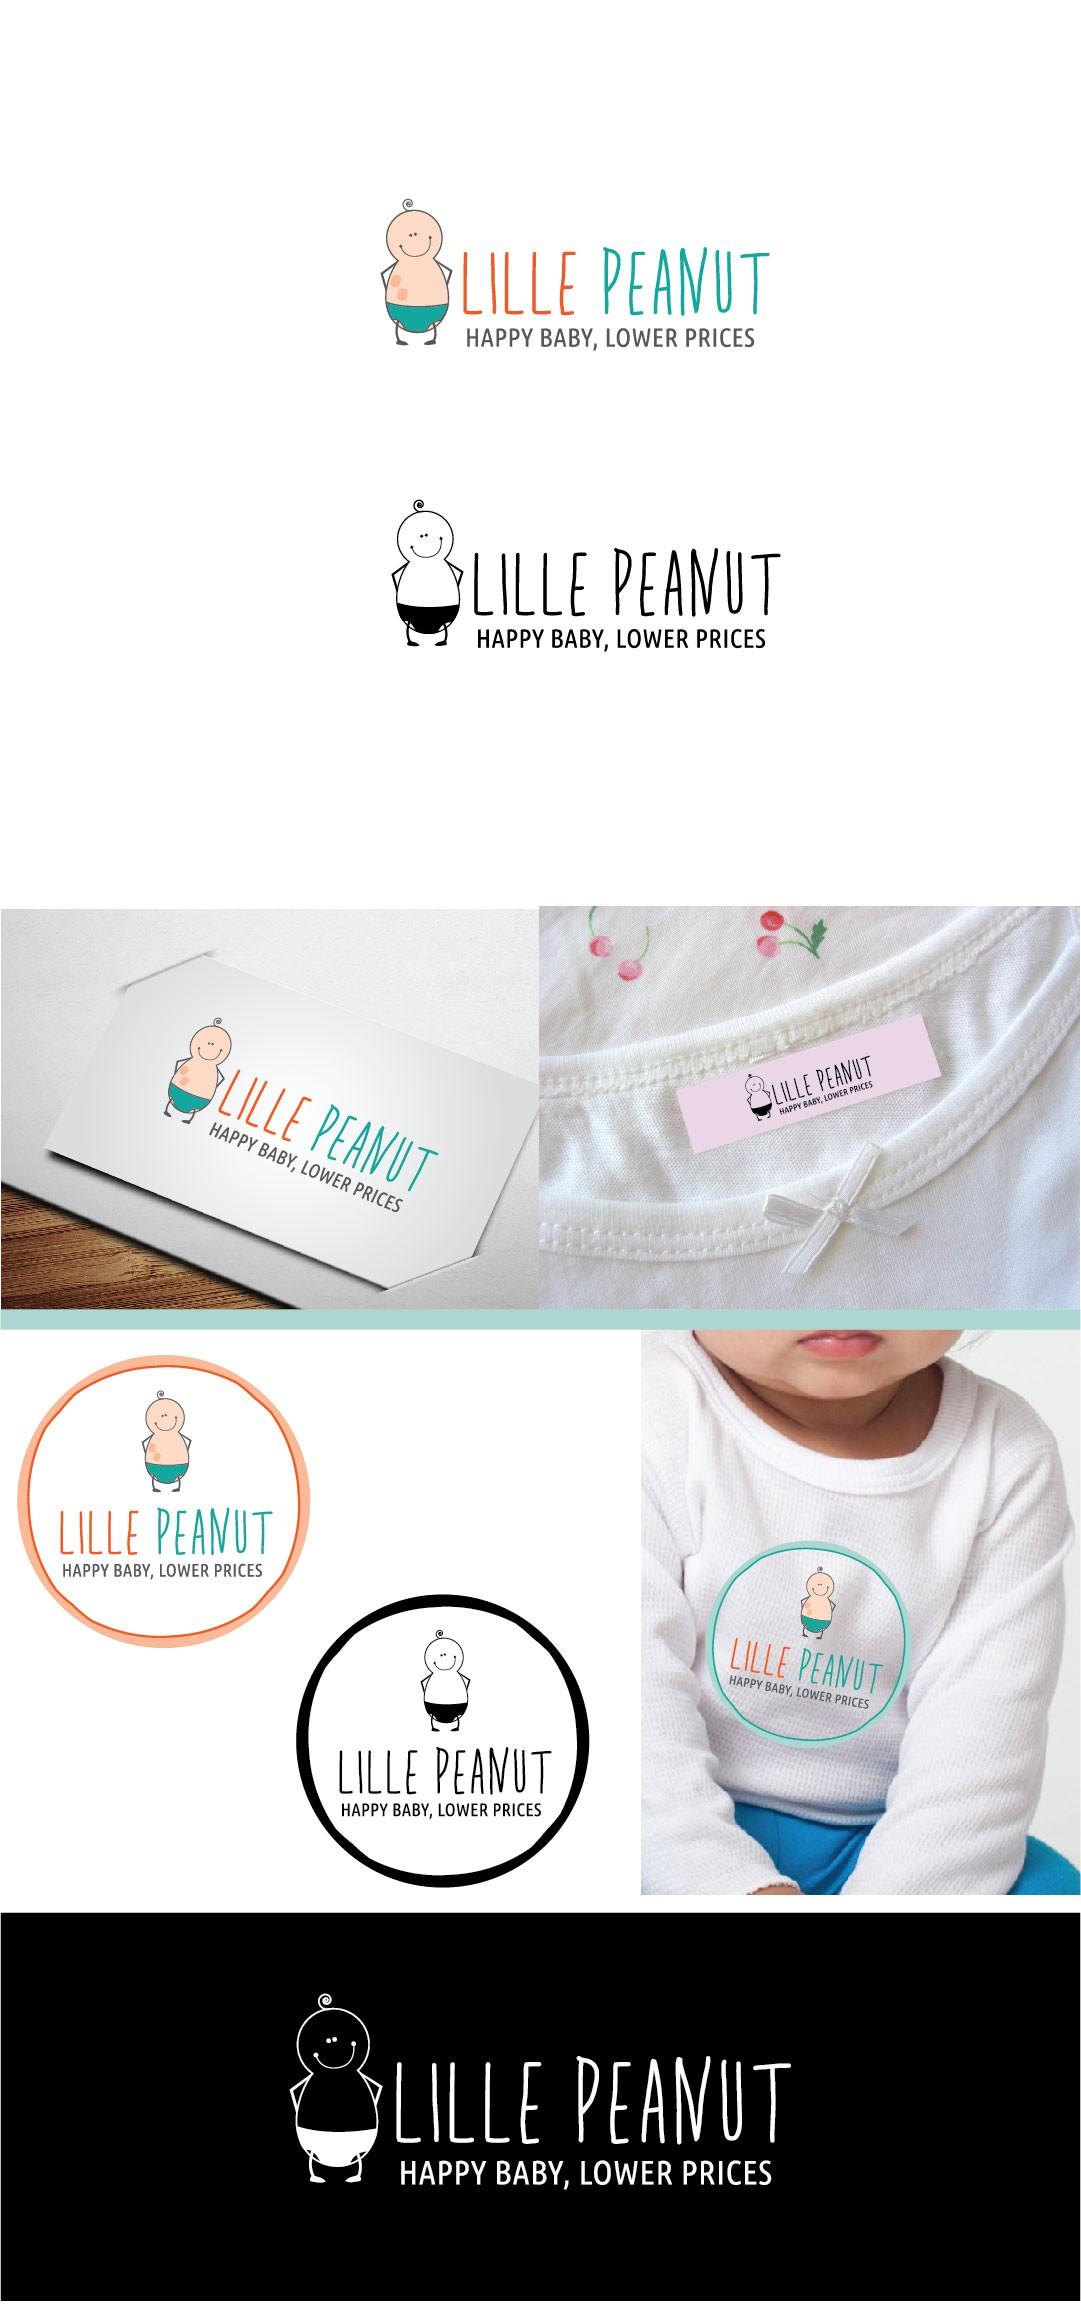 Create a baby flash sale logo targeting Scandinavia